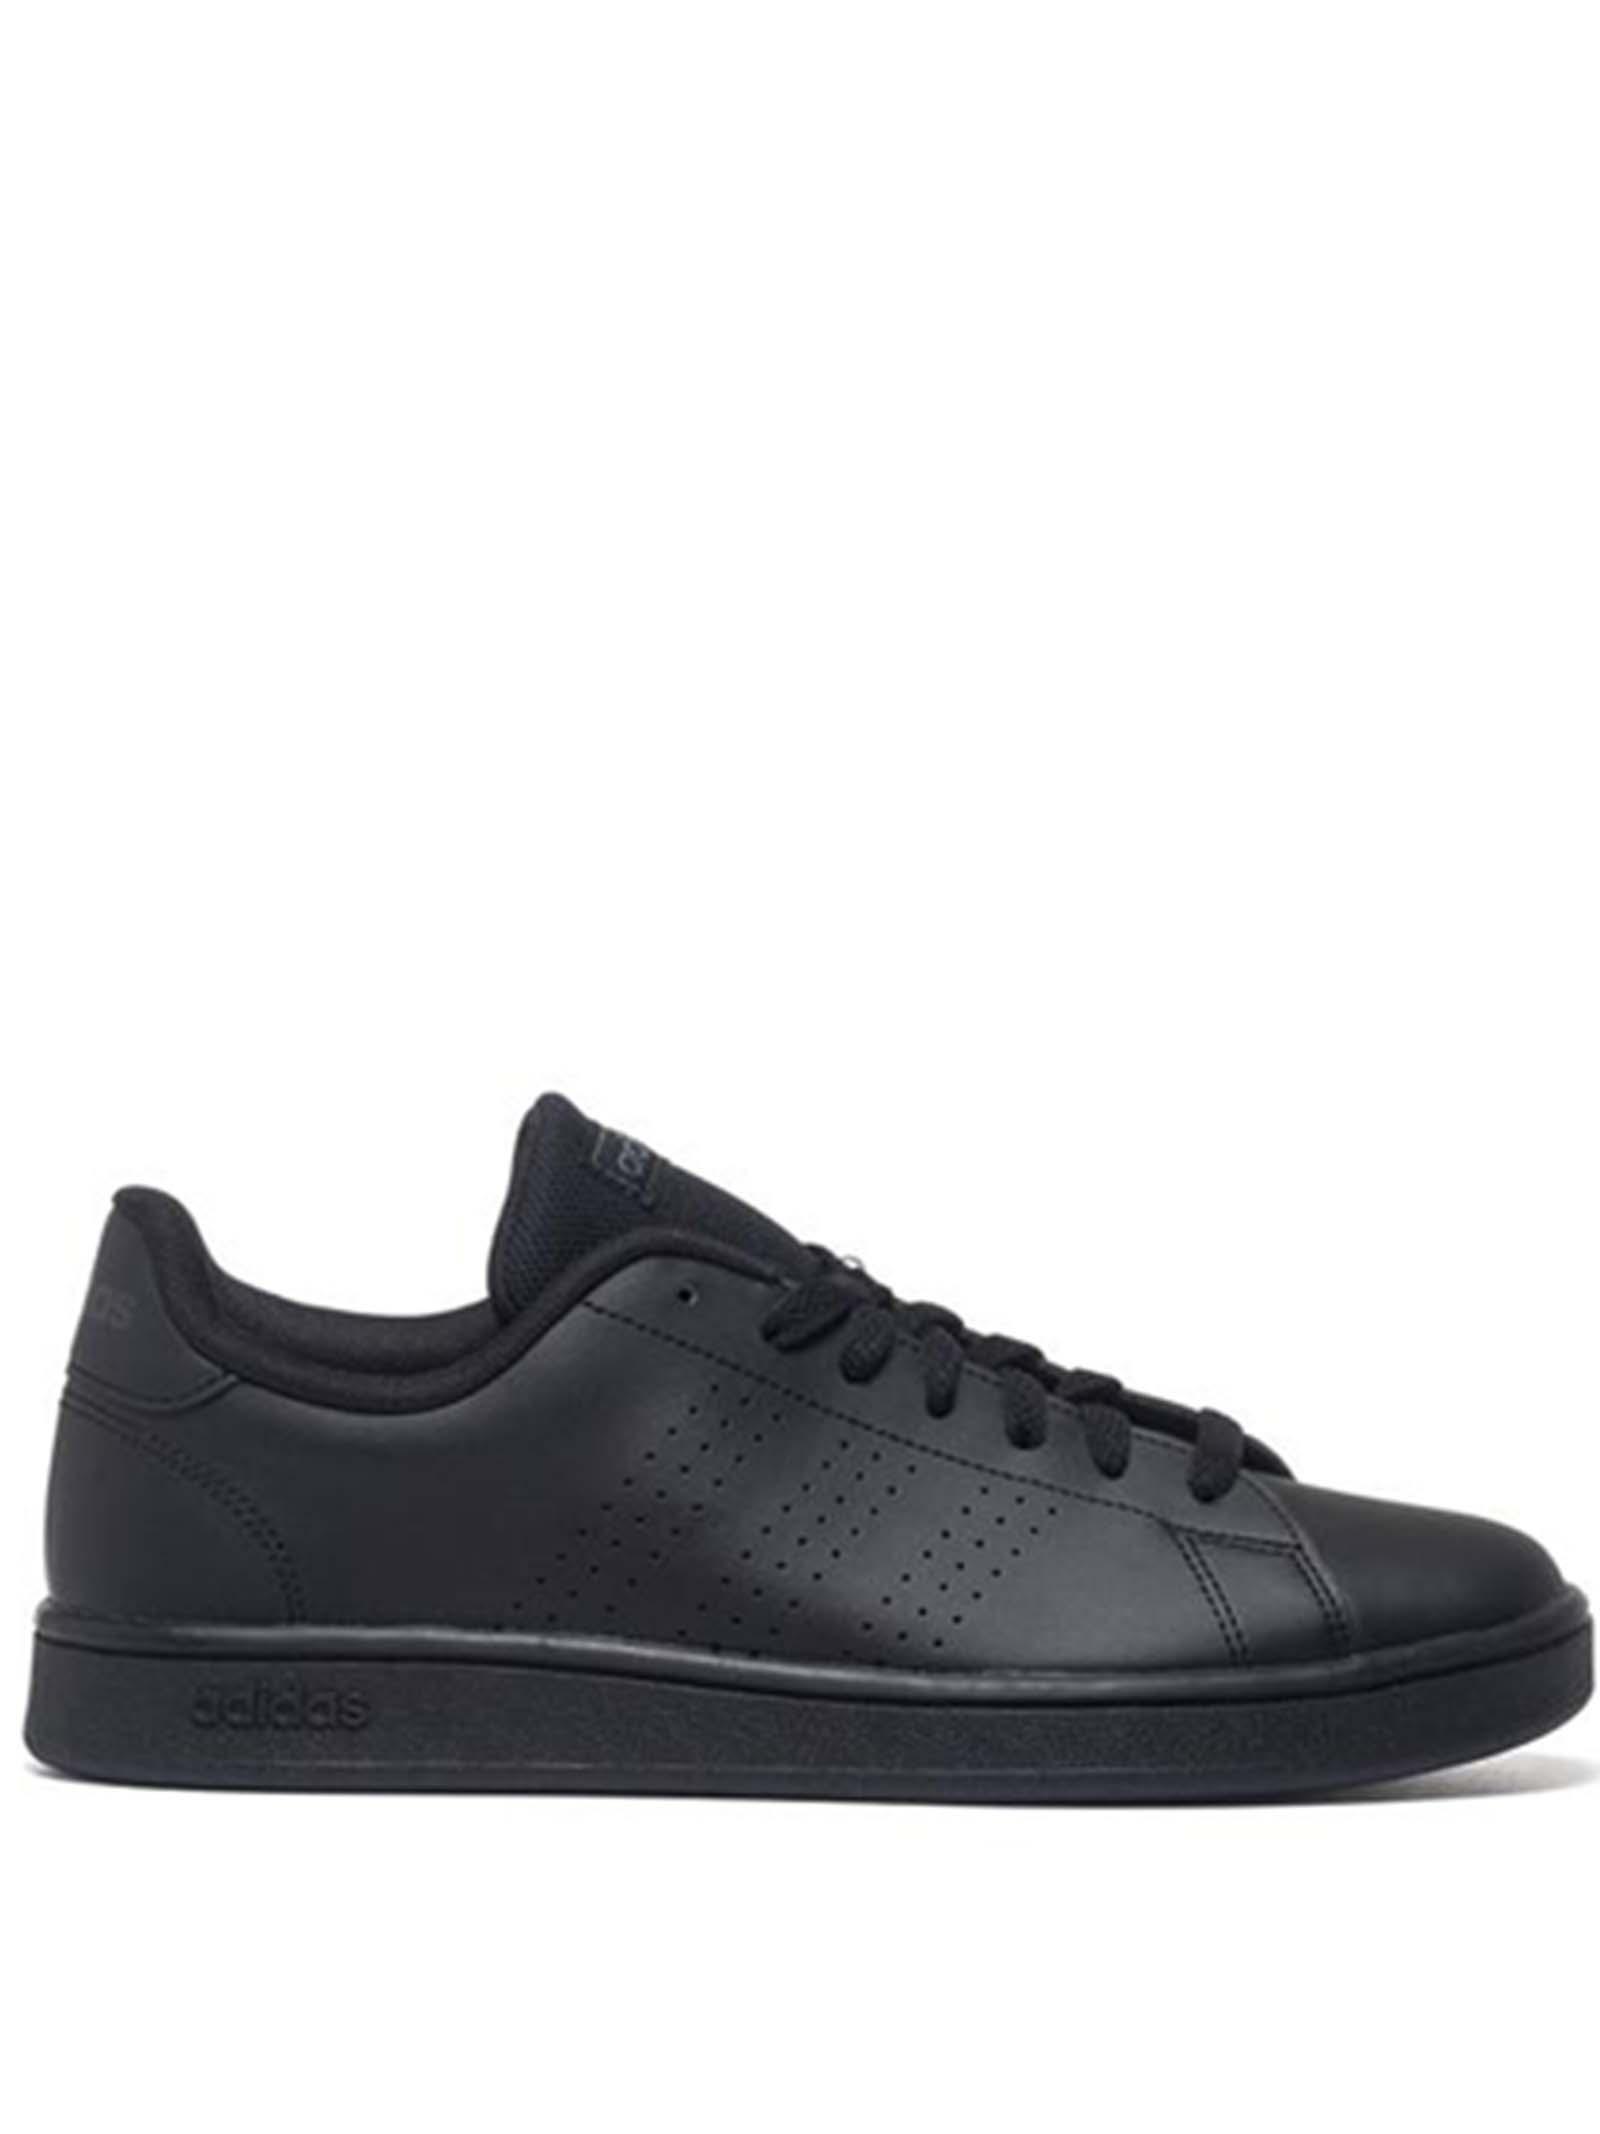 Calzature Uomo Sneakers Advantage Base in Ecopelle Nera EE7693 Adidas   Sneakers   ADVANTAGE BASEEE7693